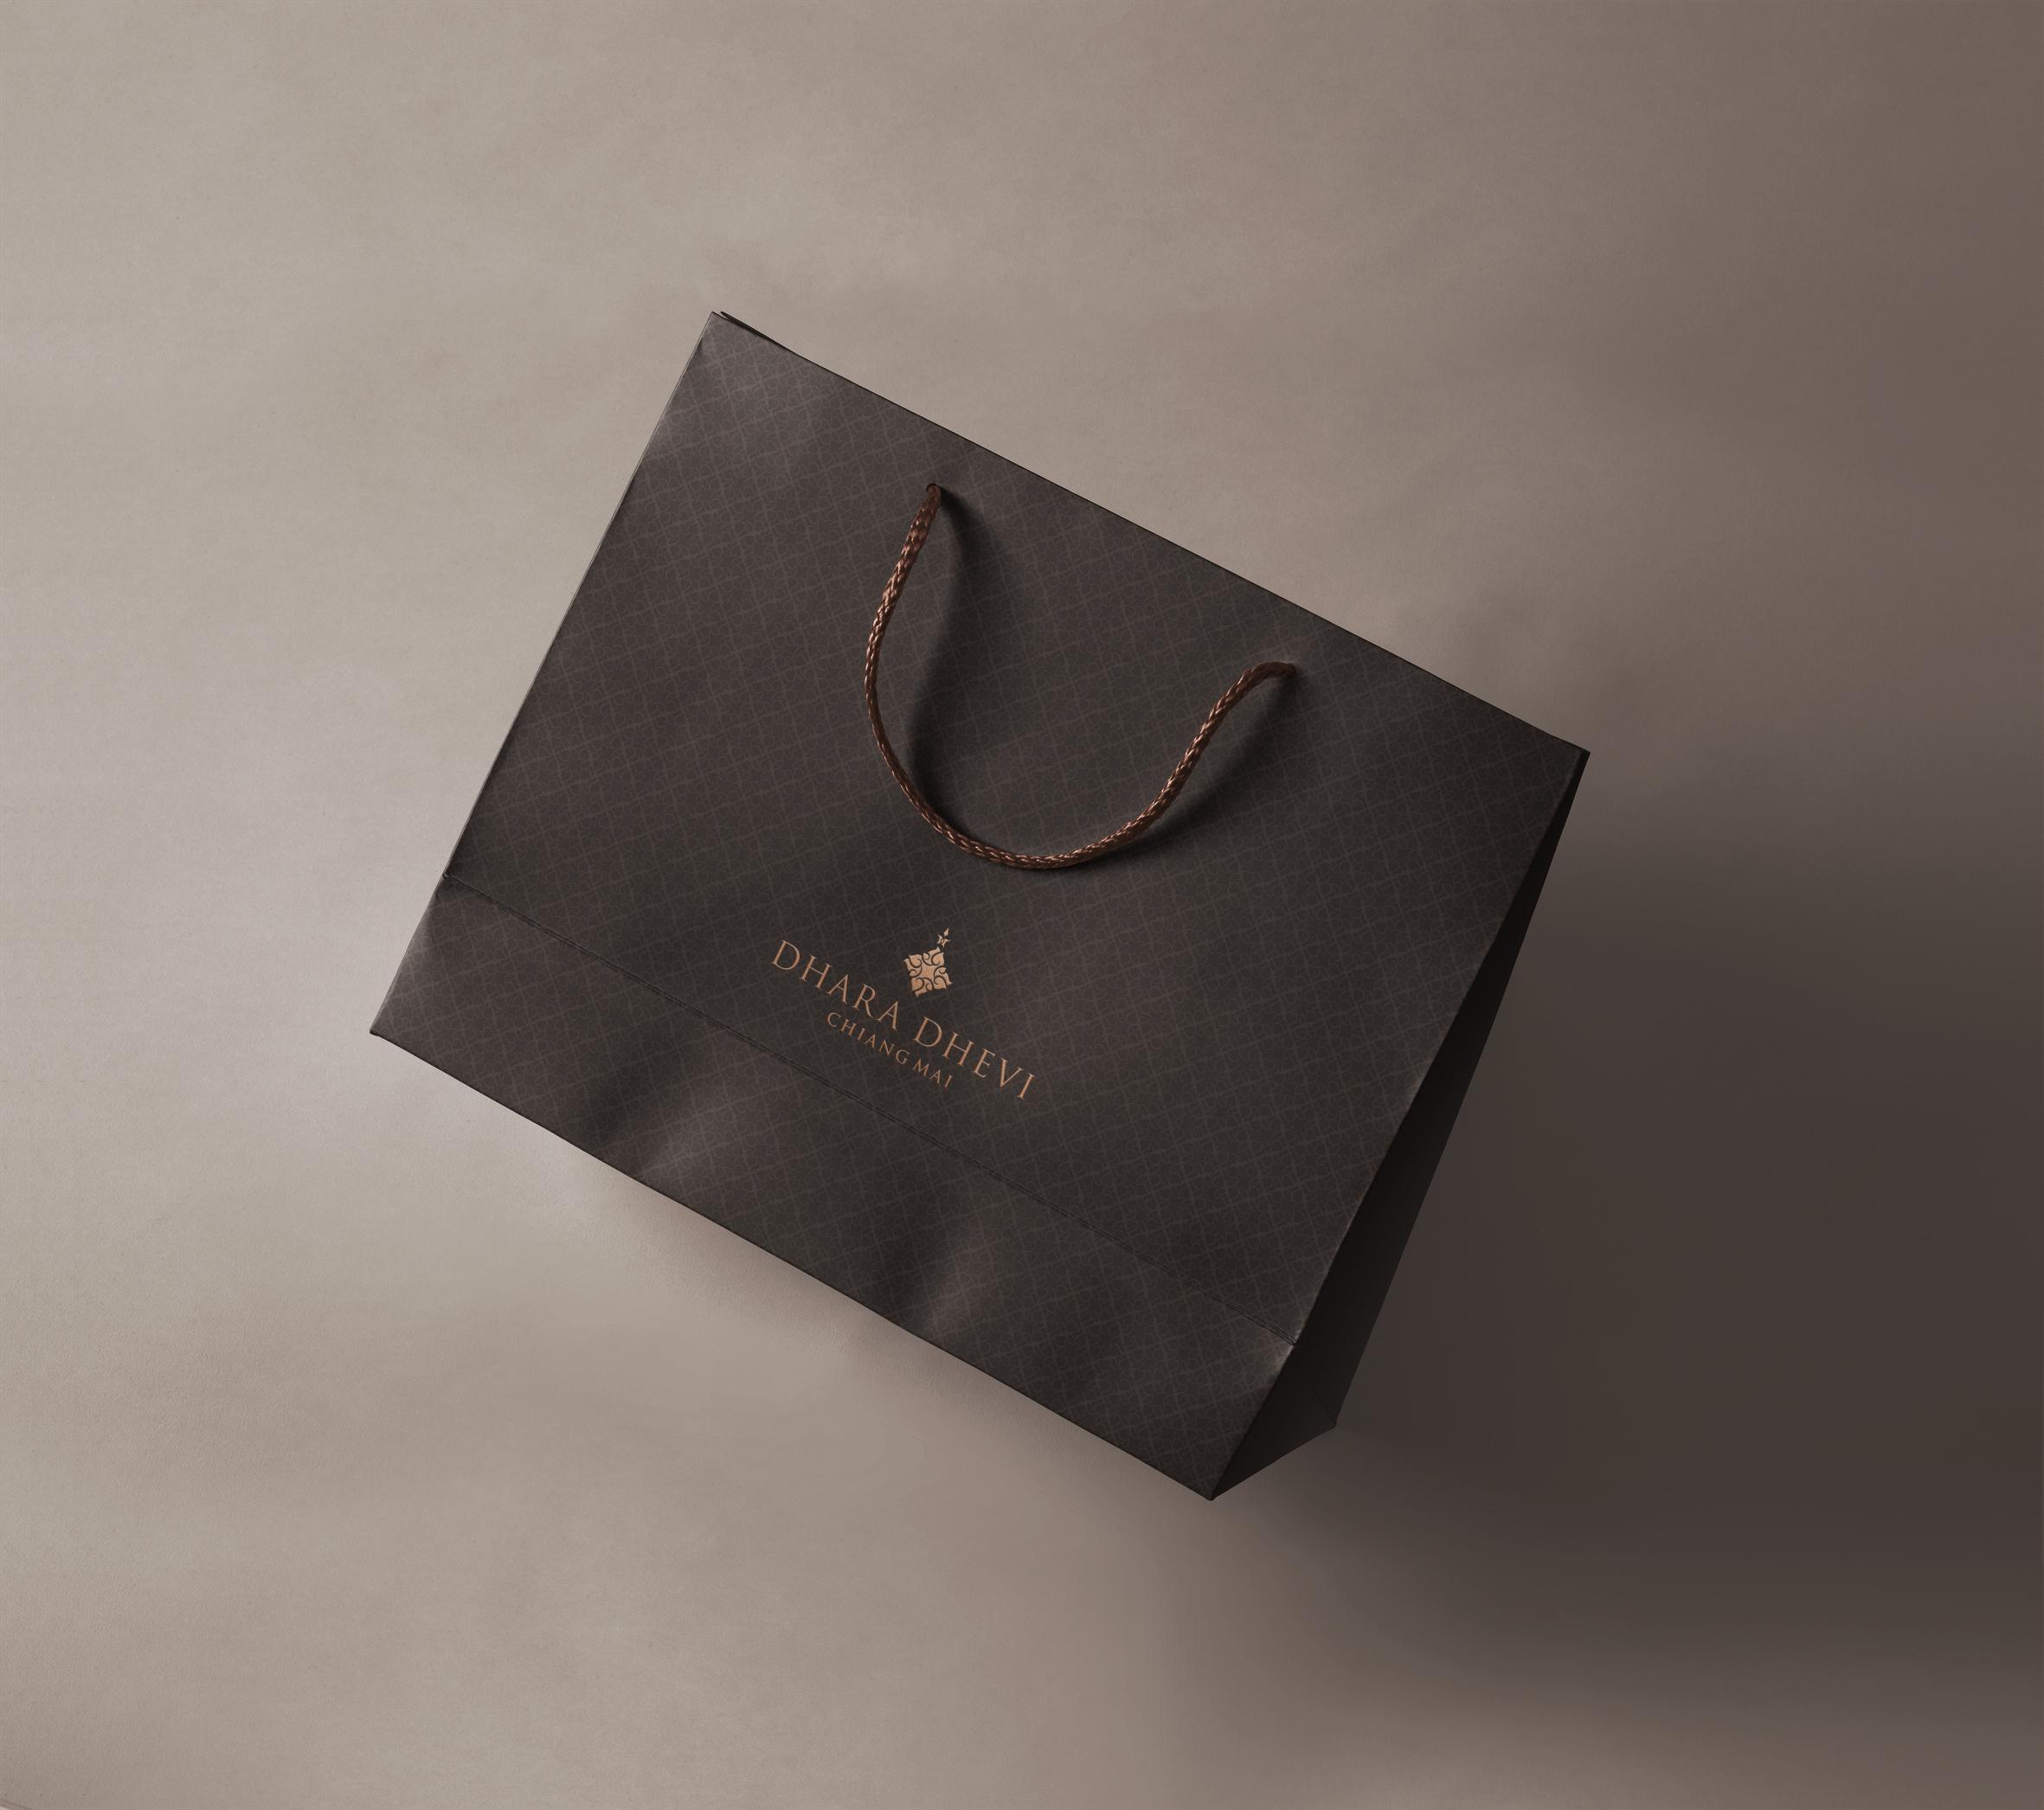 DD-shoppingbag-2.jpg